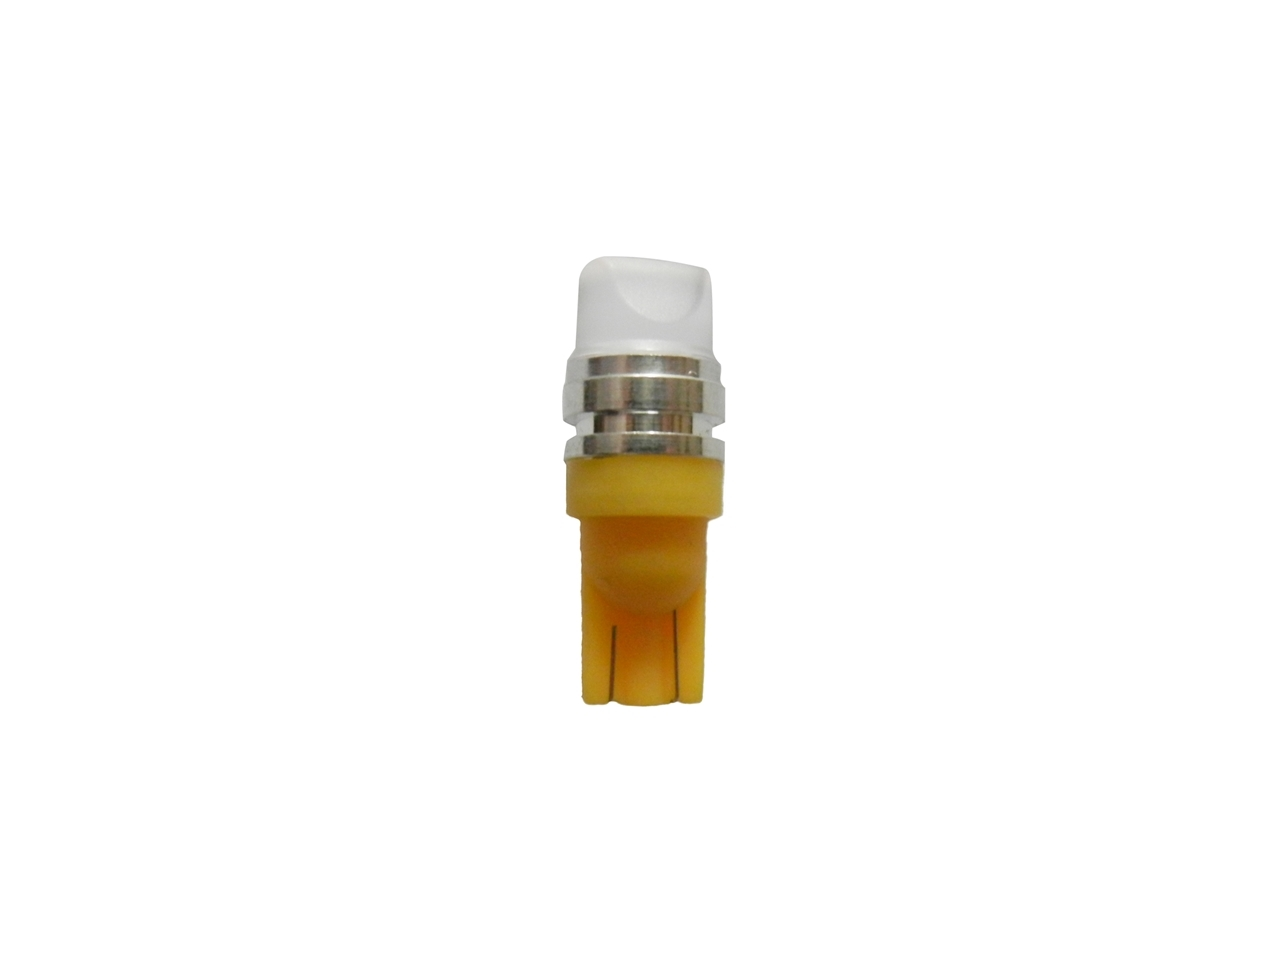 SMD LED Bulb Yellow